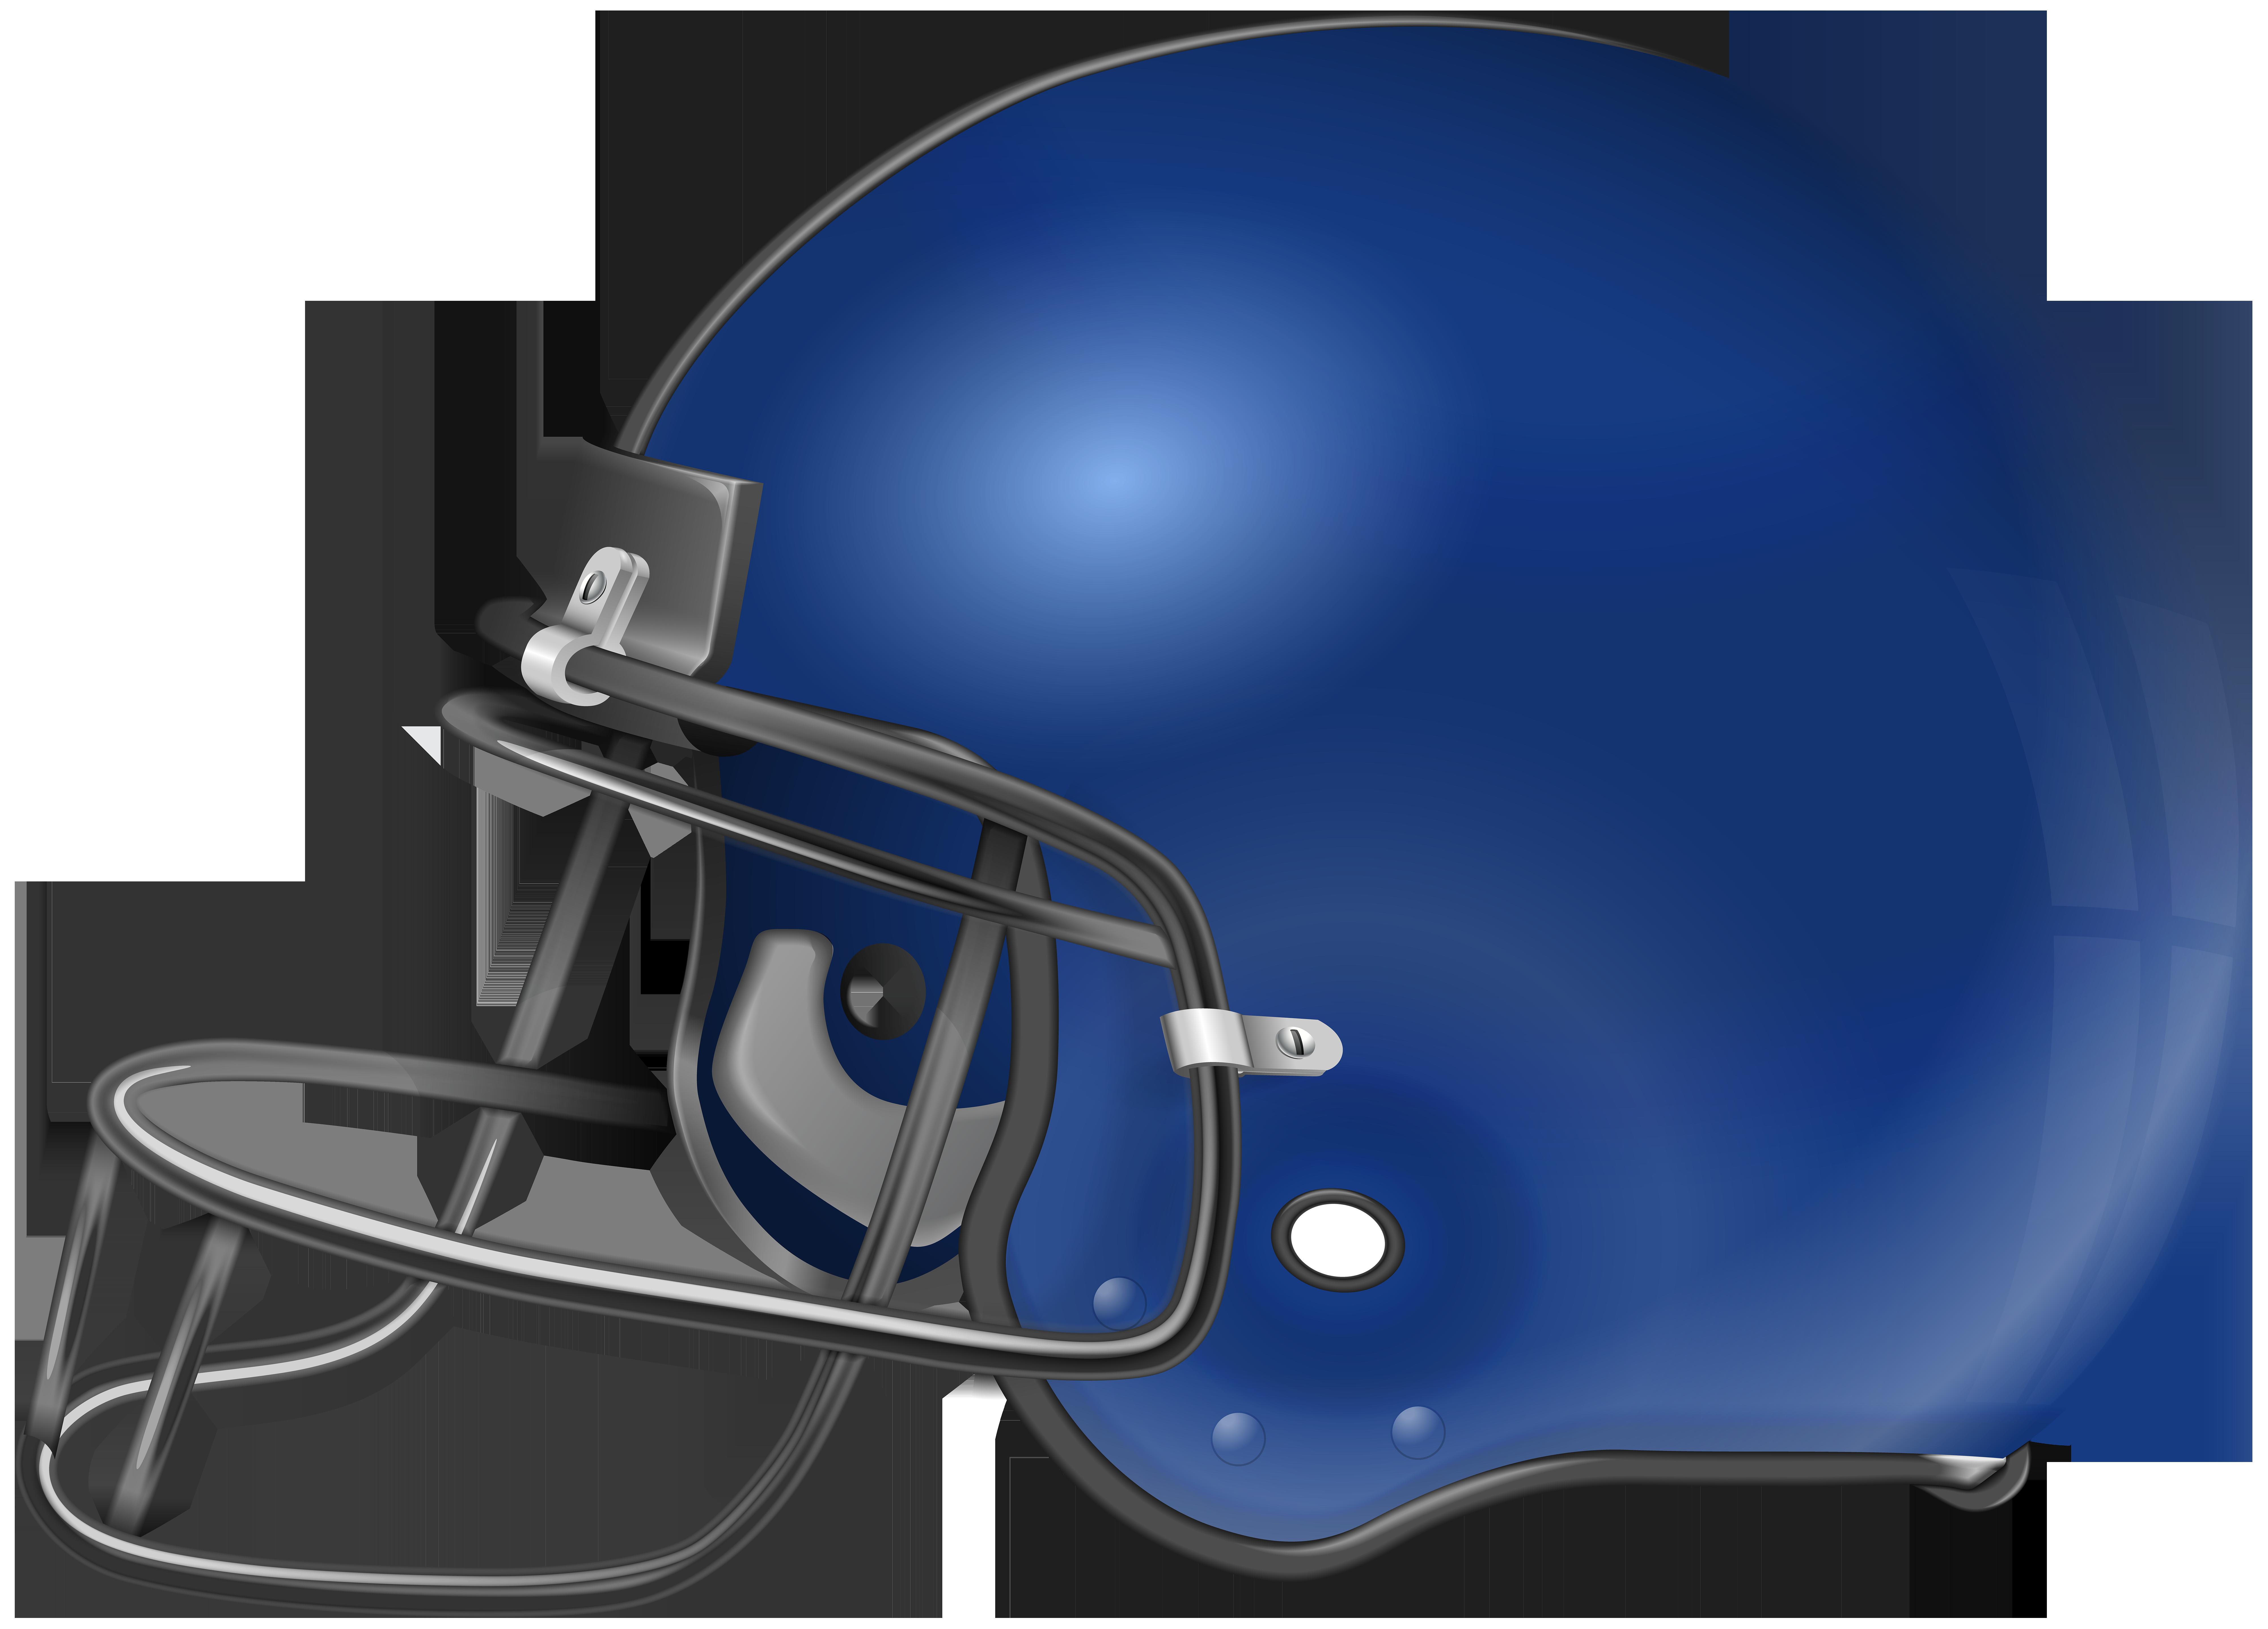 American football equipment clipart svg royalty free download Football helmet Ole Miss Rebels football American football ... svg royalty free download